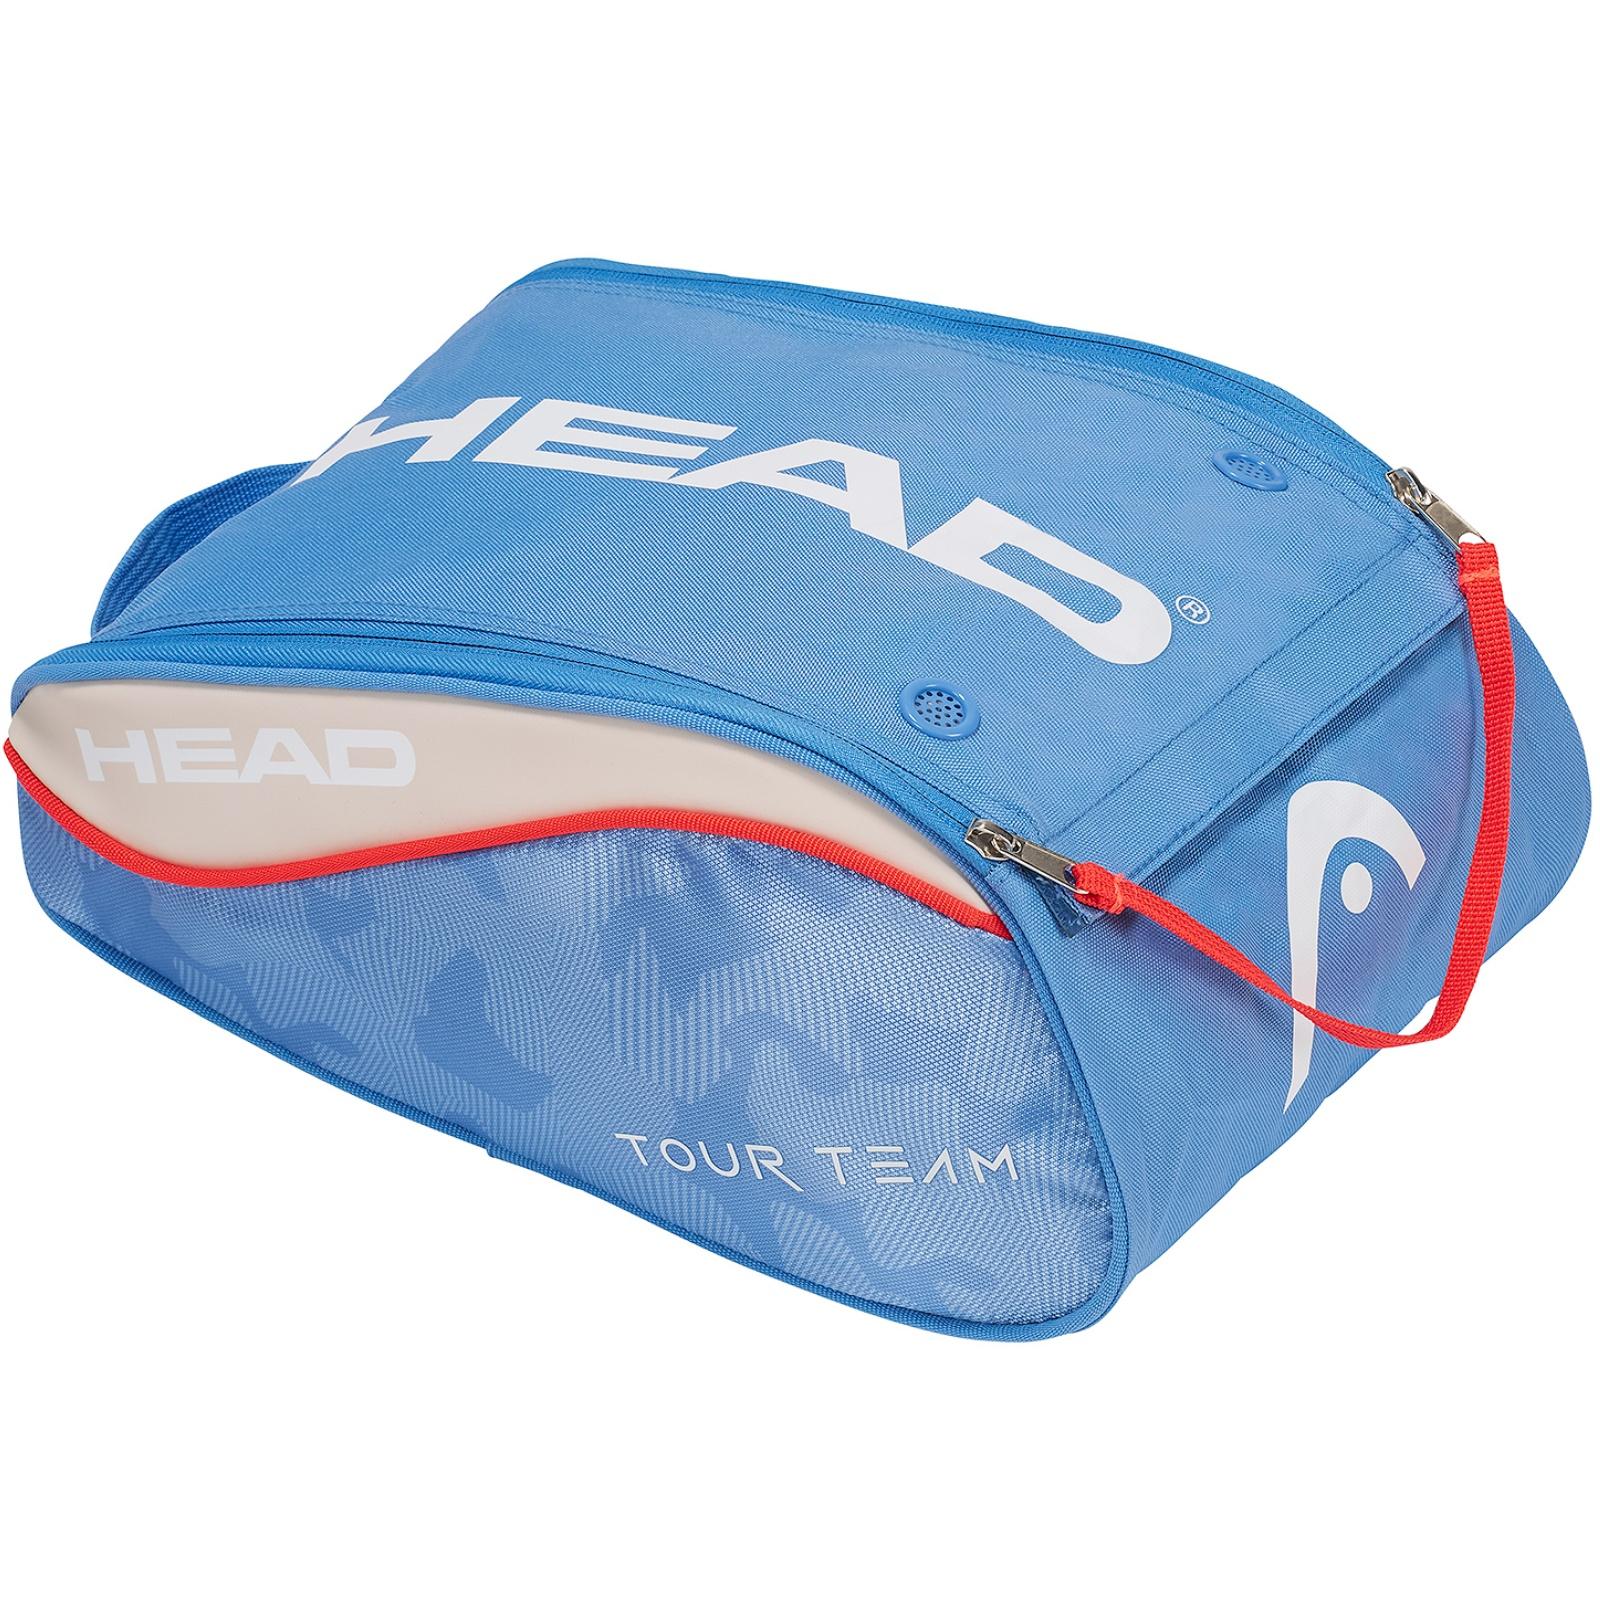 Tenisová taška HEAD Tour Shoe bag - modrá